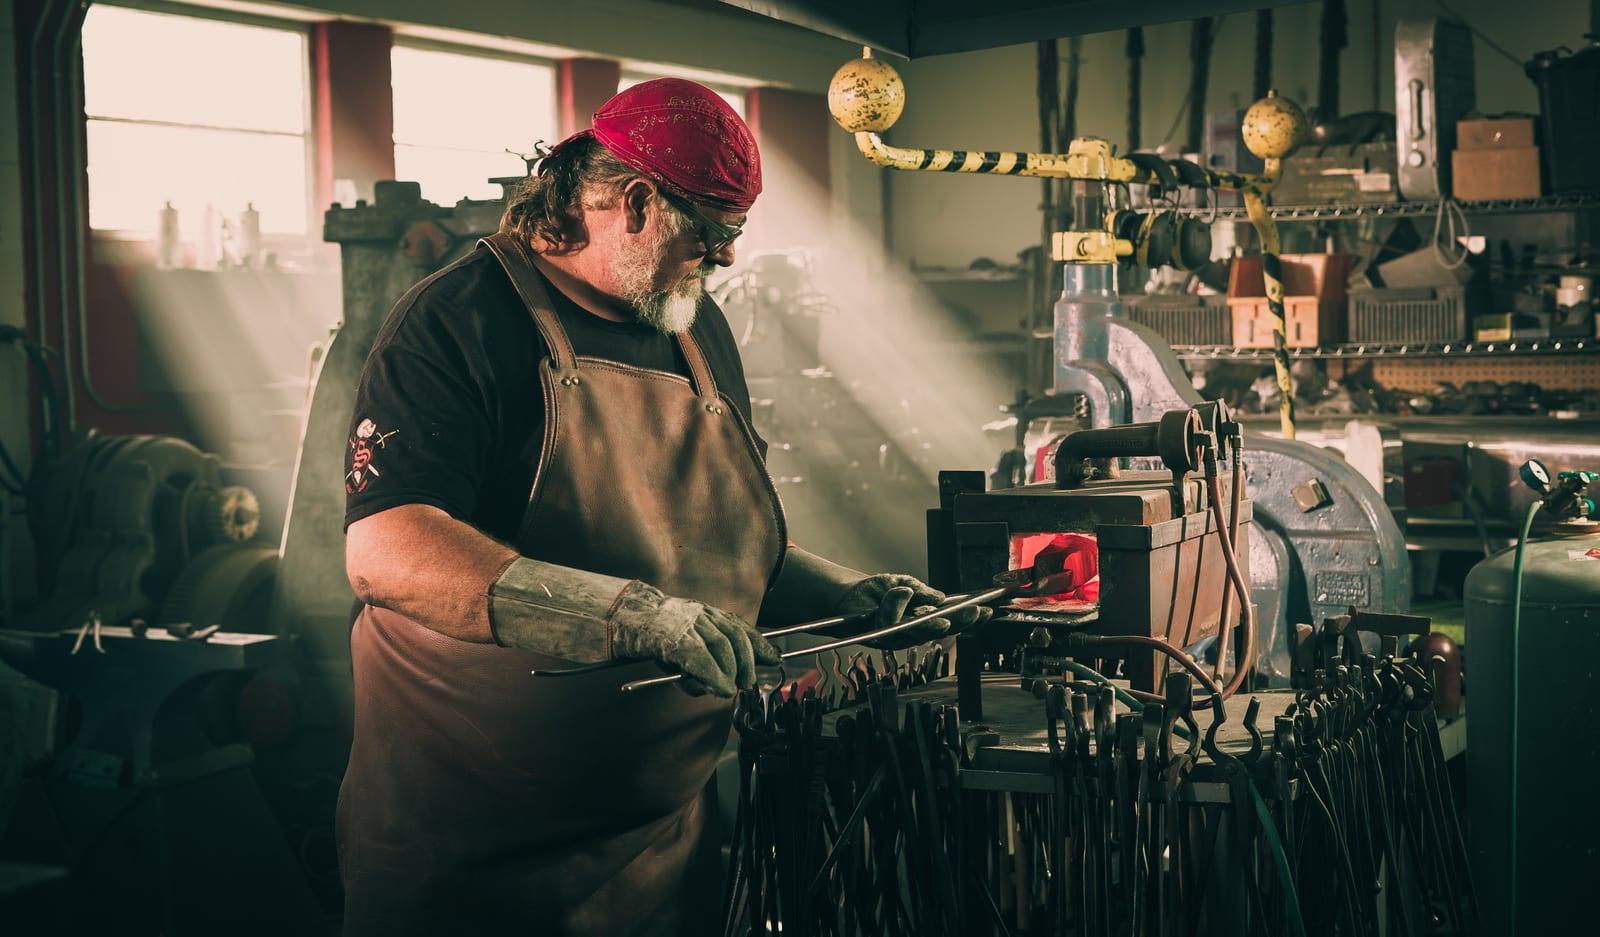 Tony Swatton – The Biggest Steel Fabricator in the World